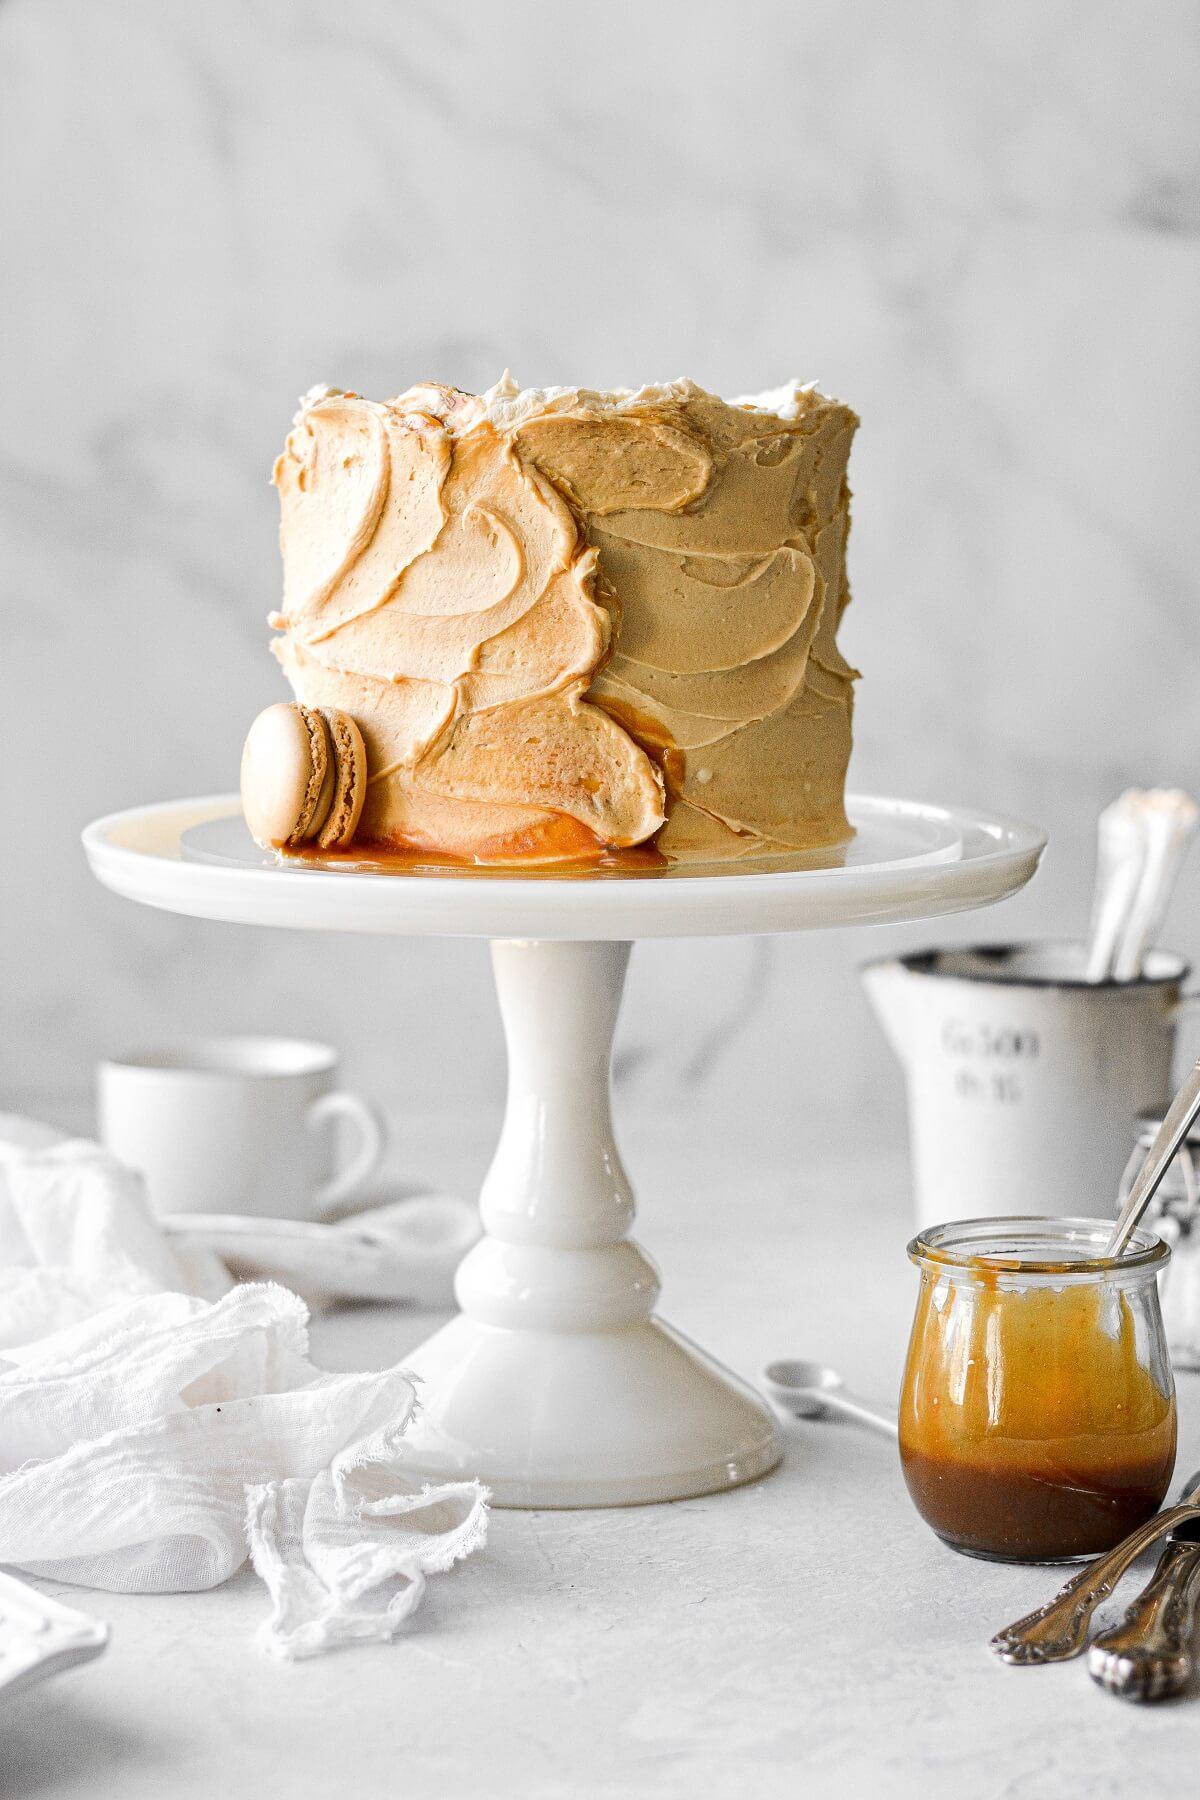 Caramel cake on a white cake pedestal.